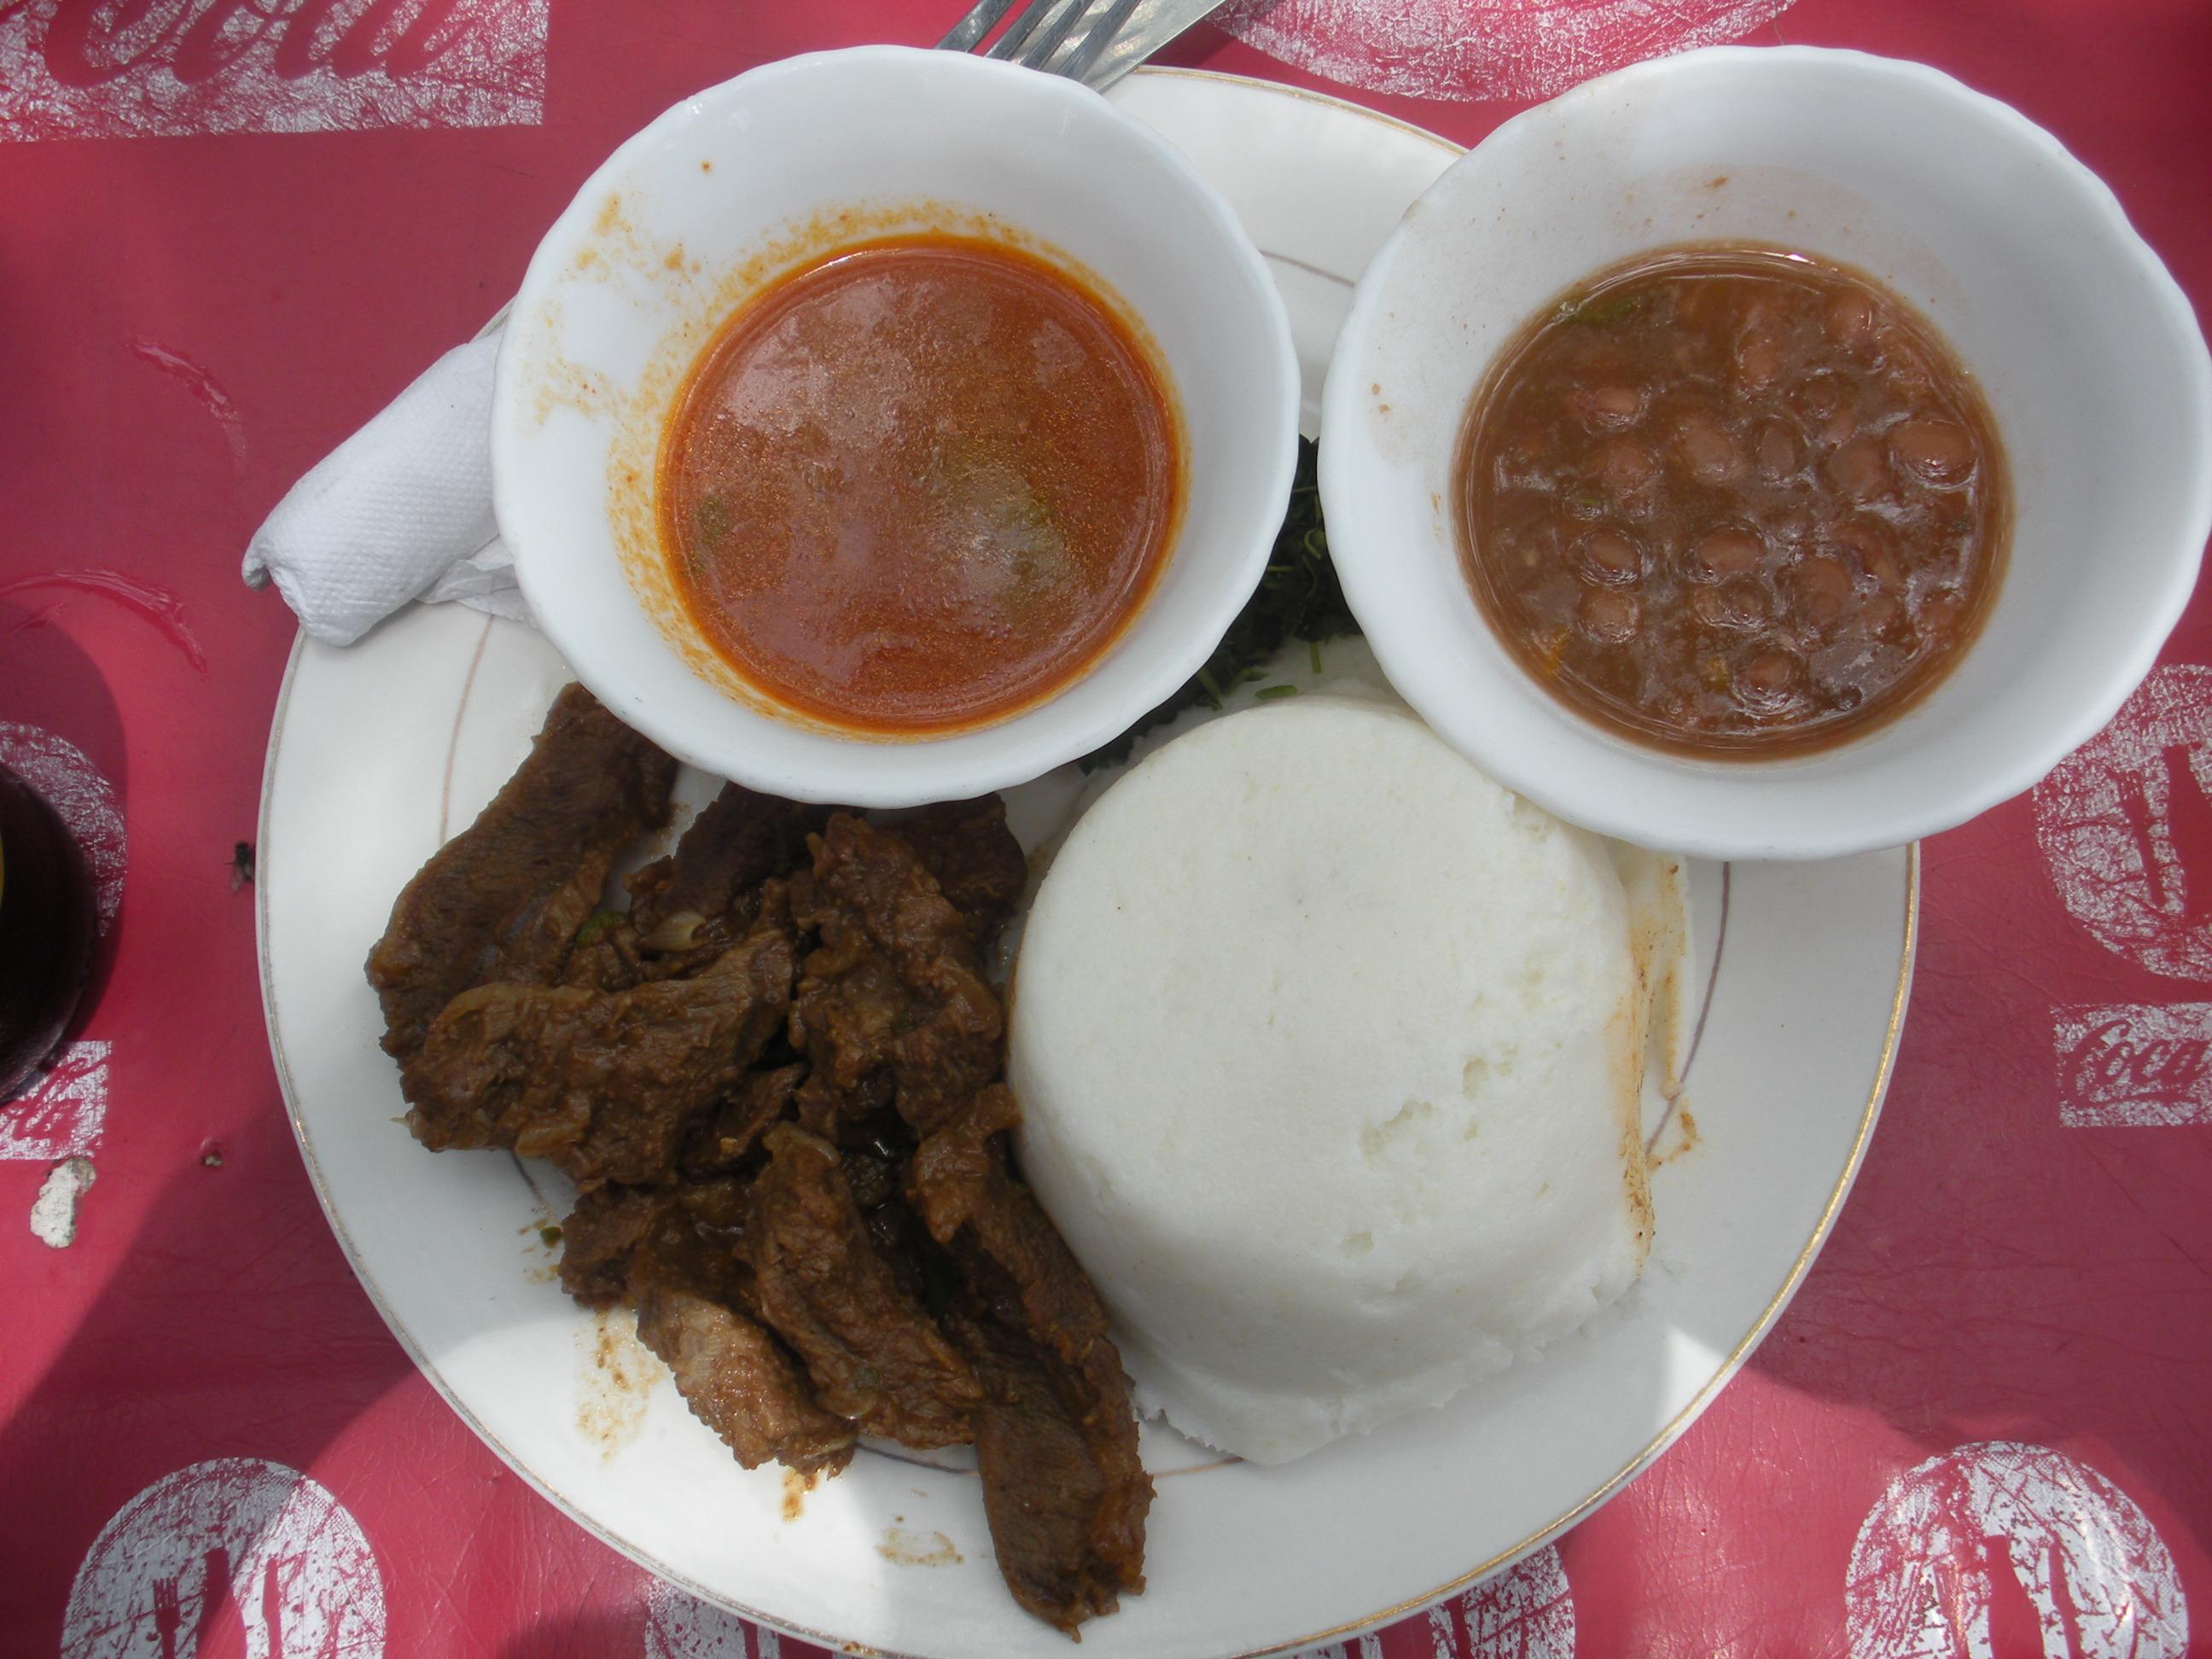 Dar es Salaam: Culture